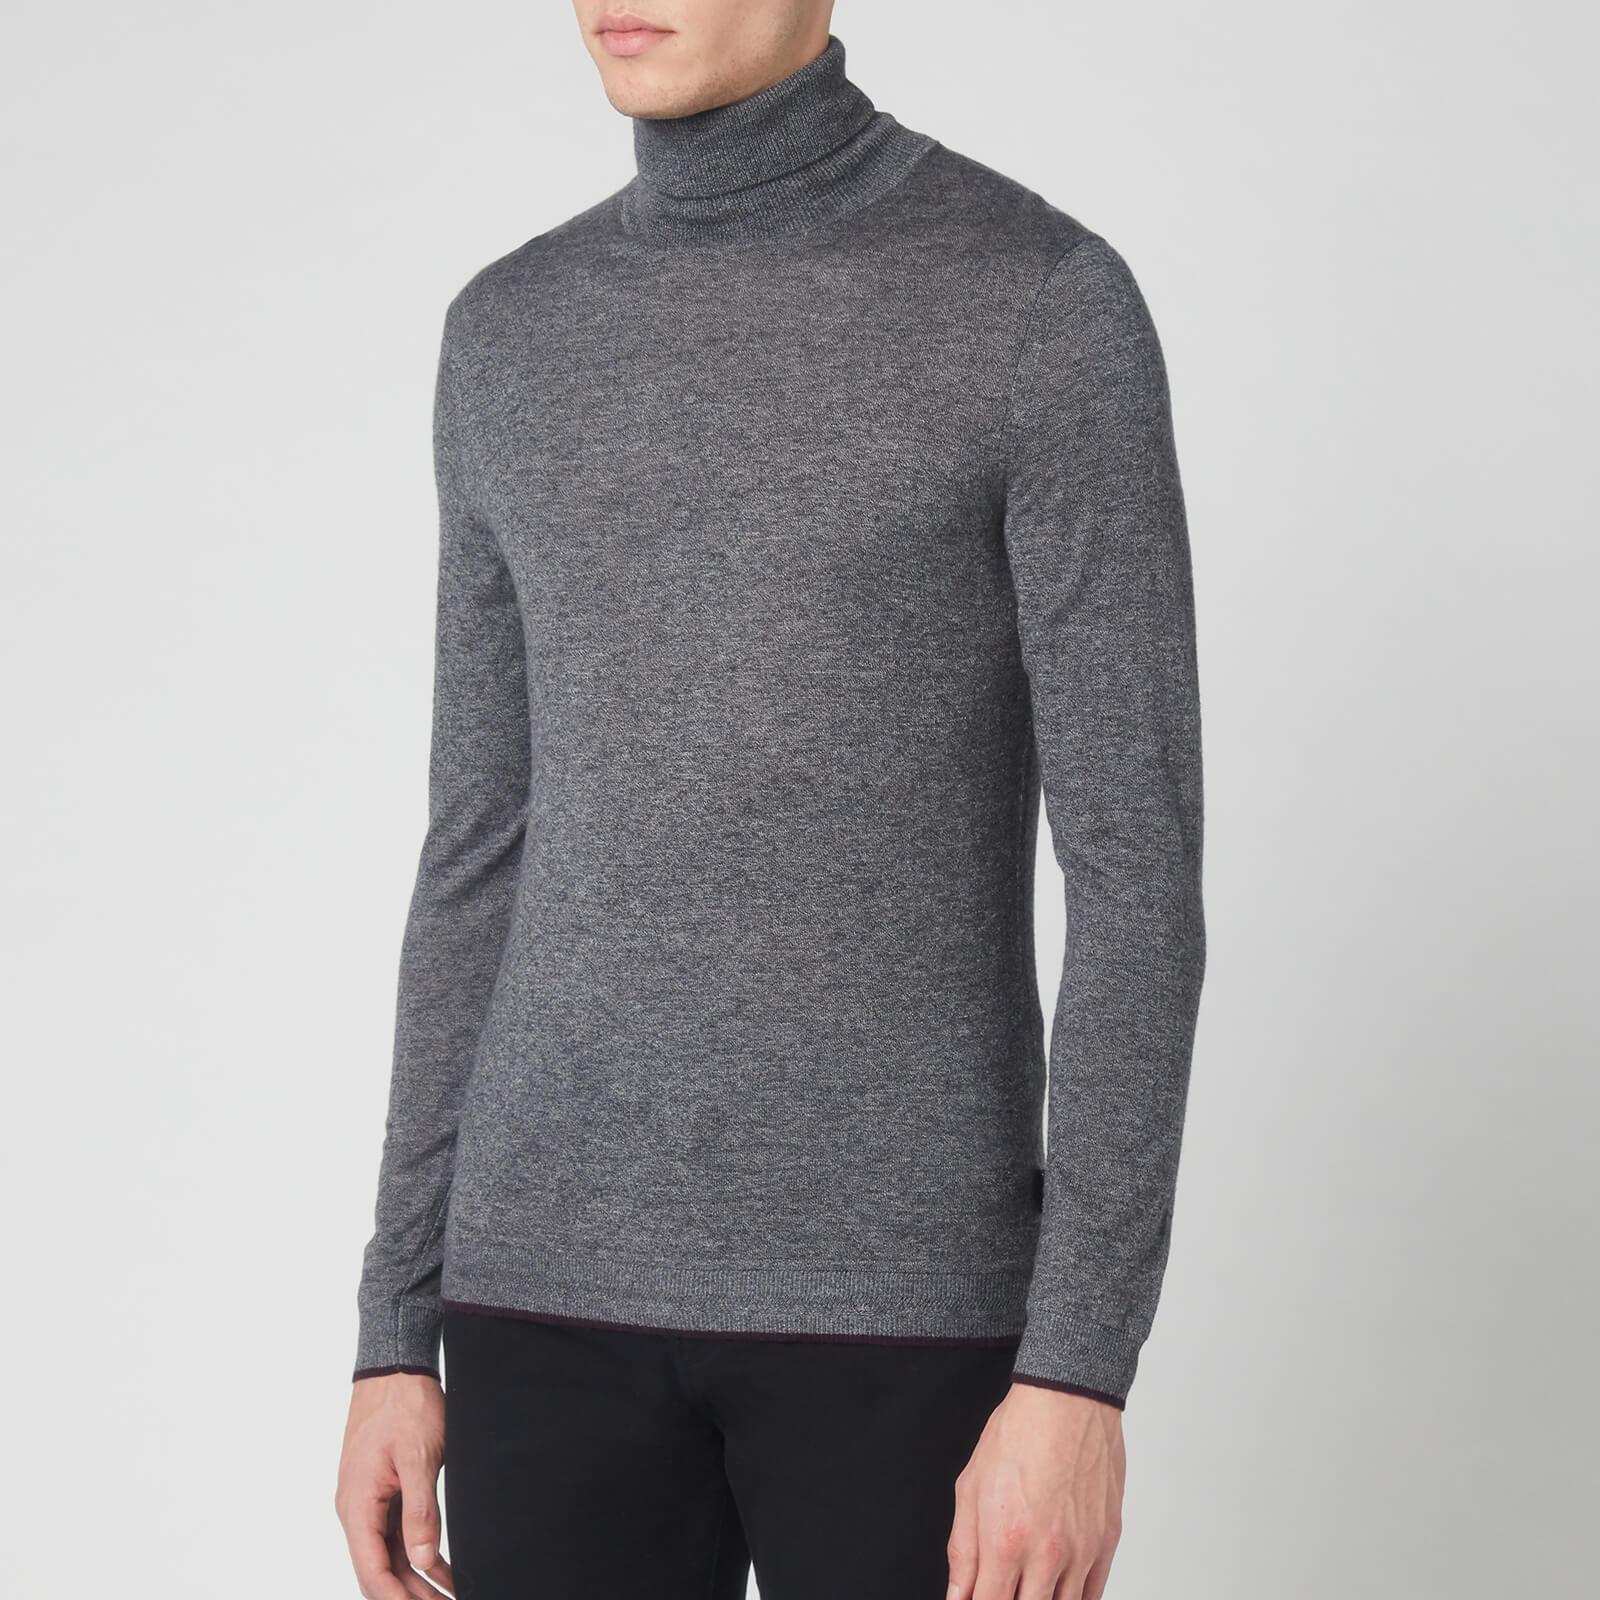 Ted Baker Men's Newtrik Fitted Roll Neck Sweatshirt - Grey Marl - L/4